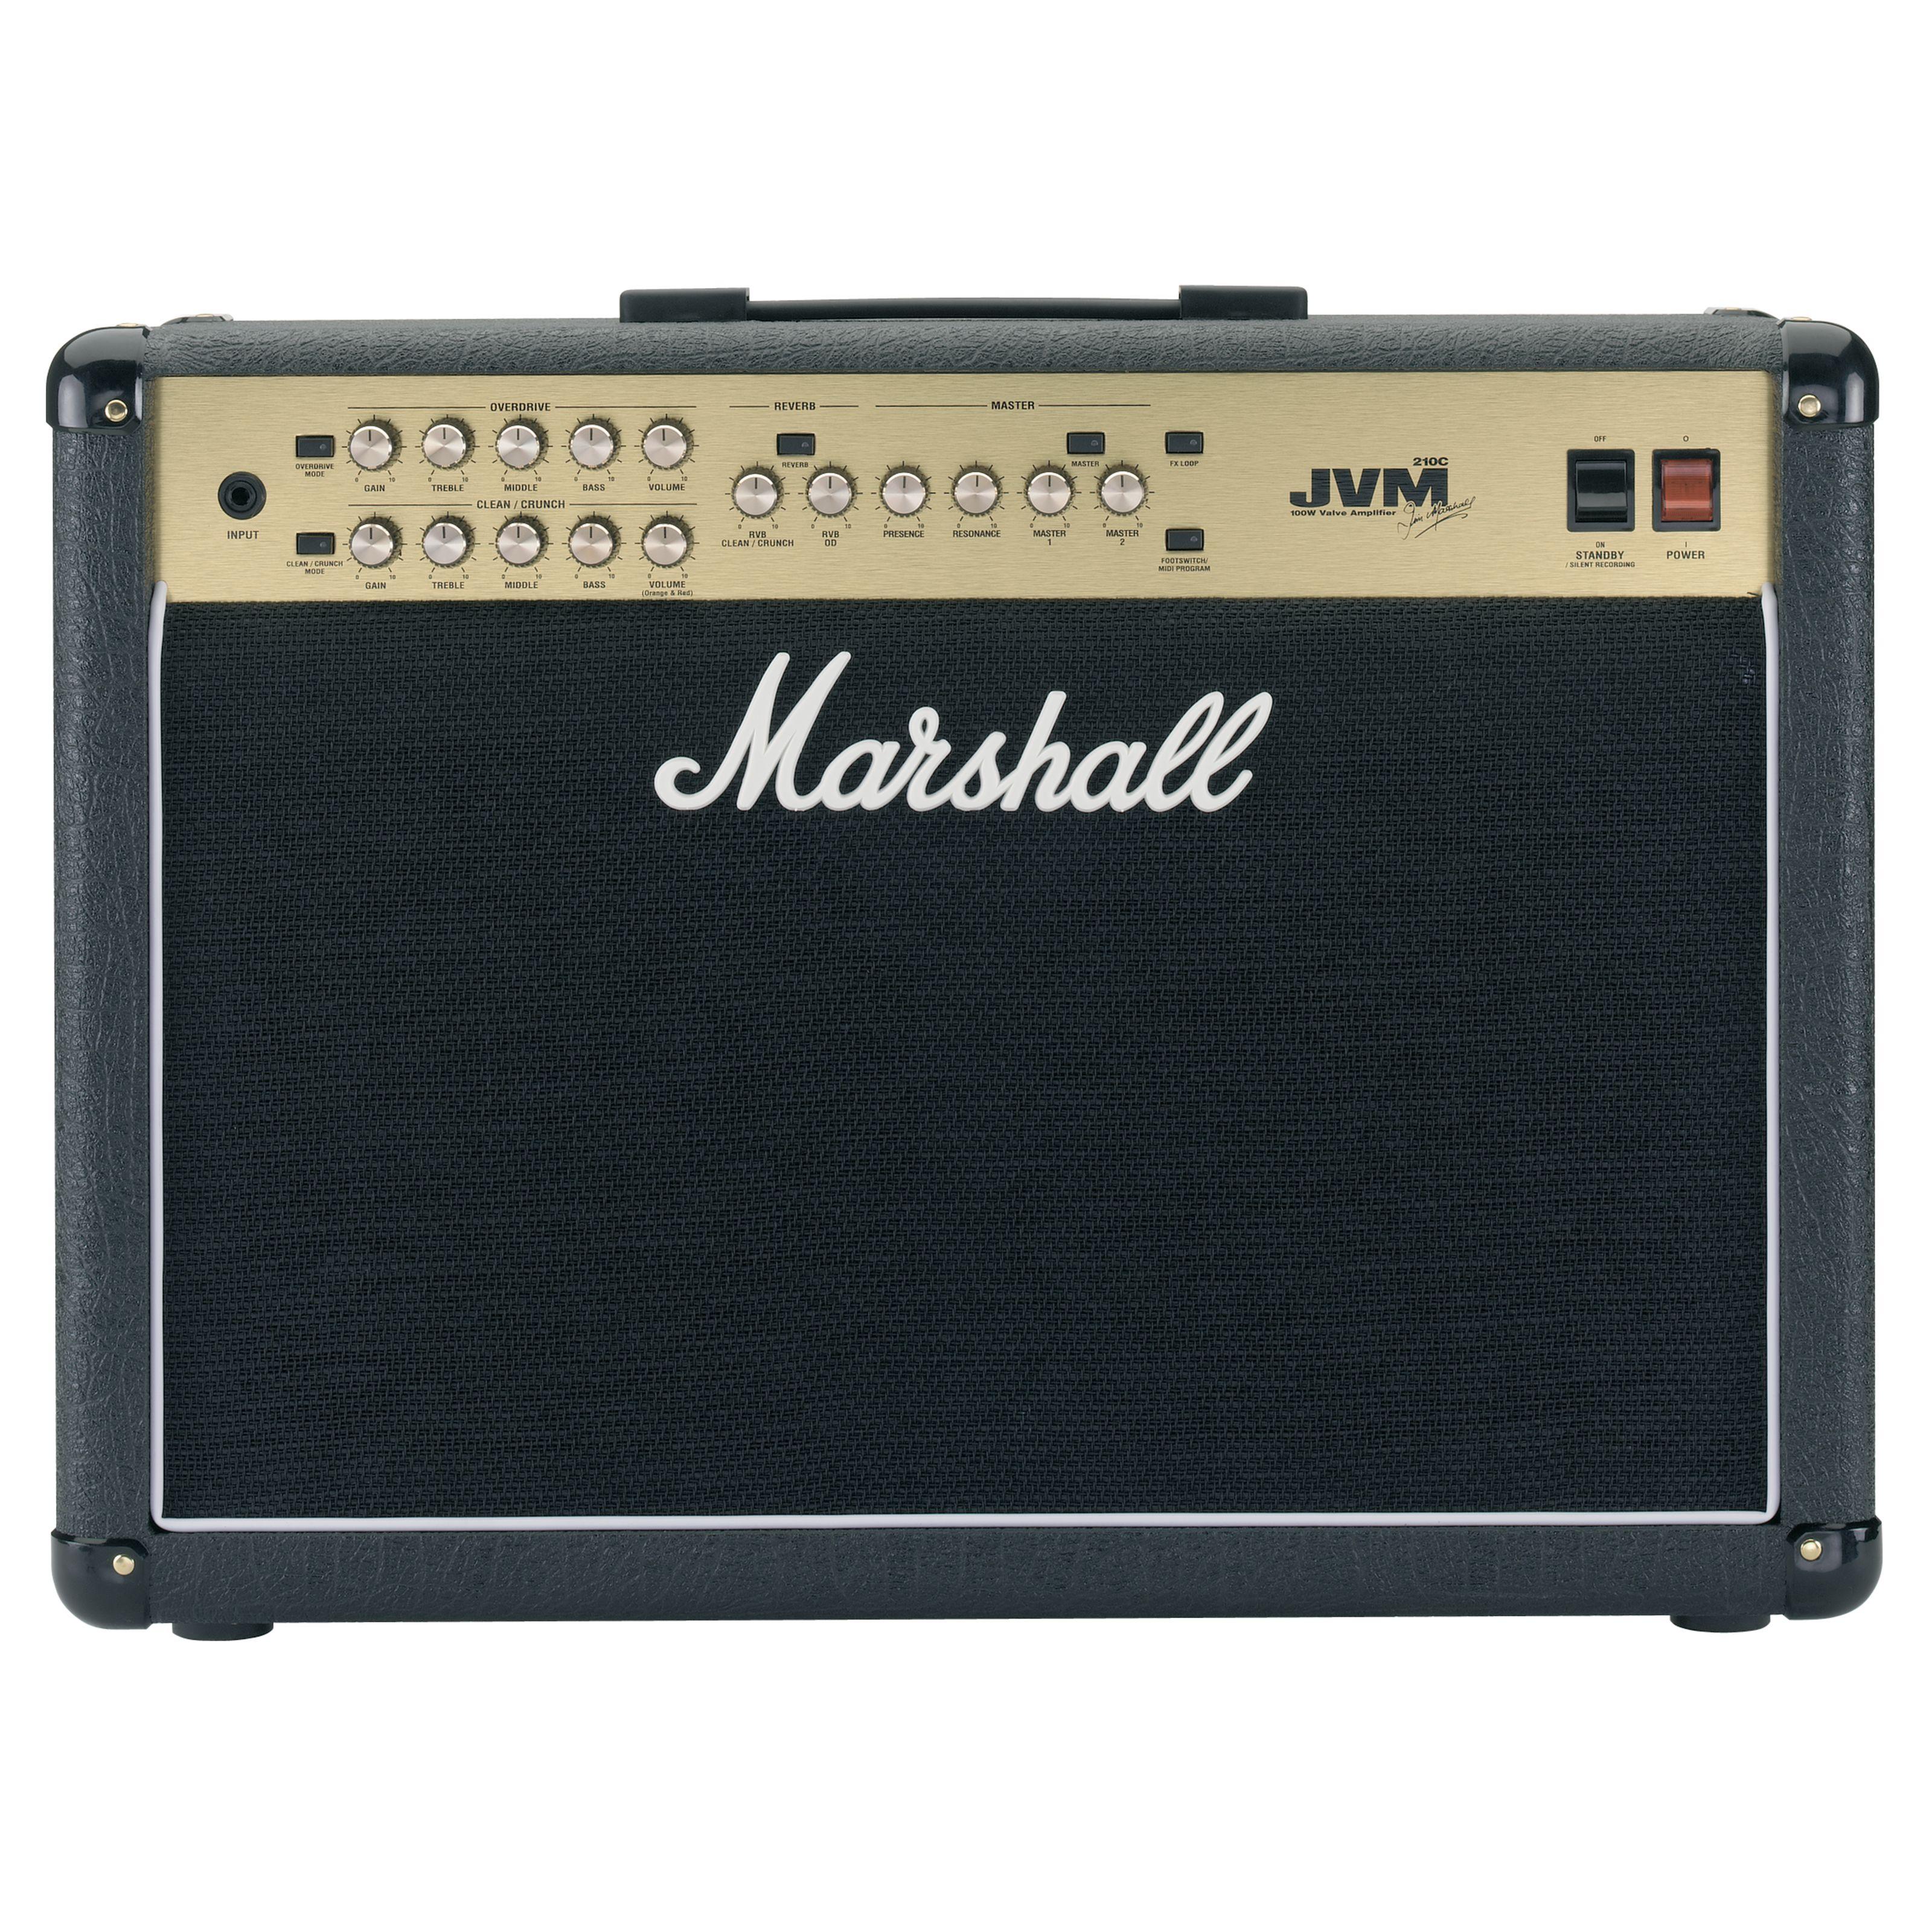 Marshall - JVM 210 C Combo